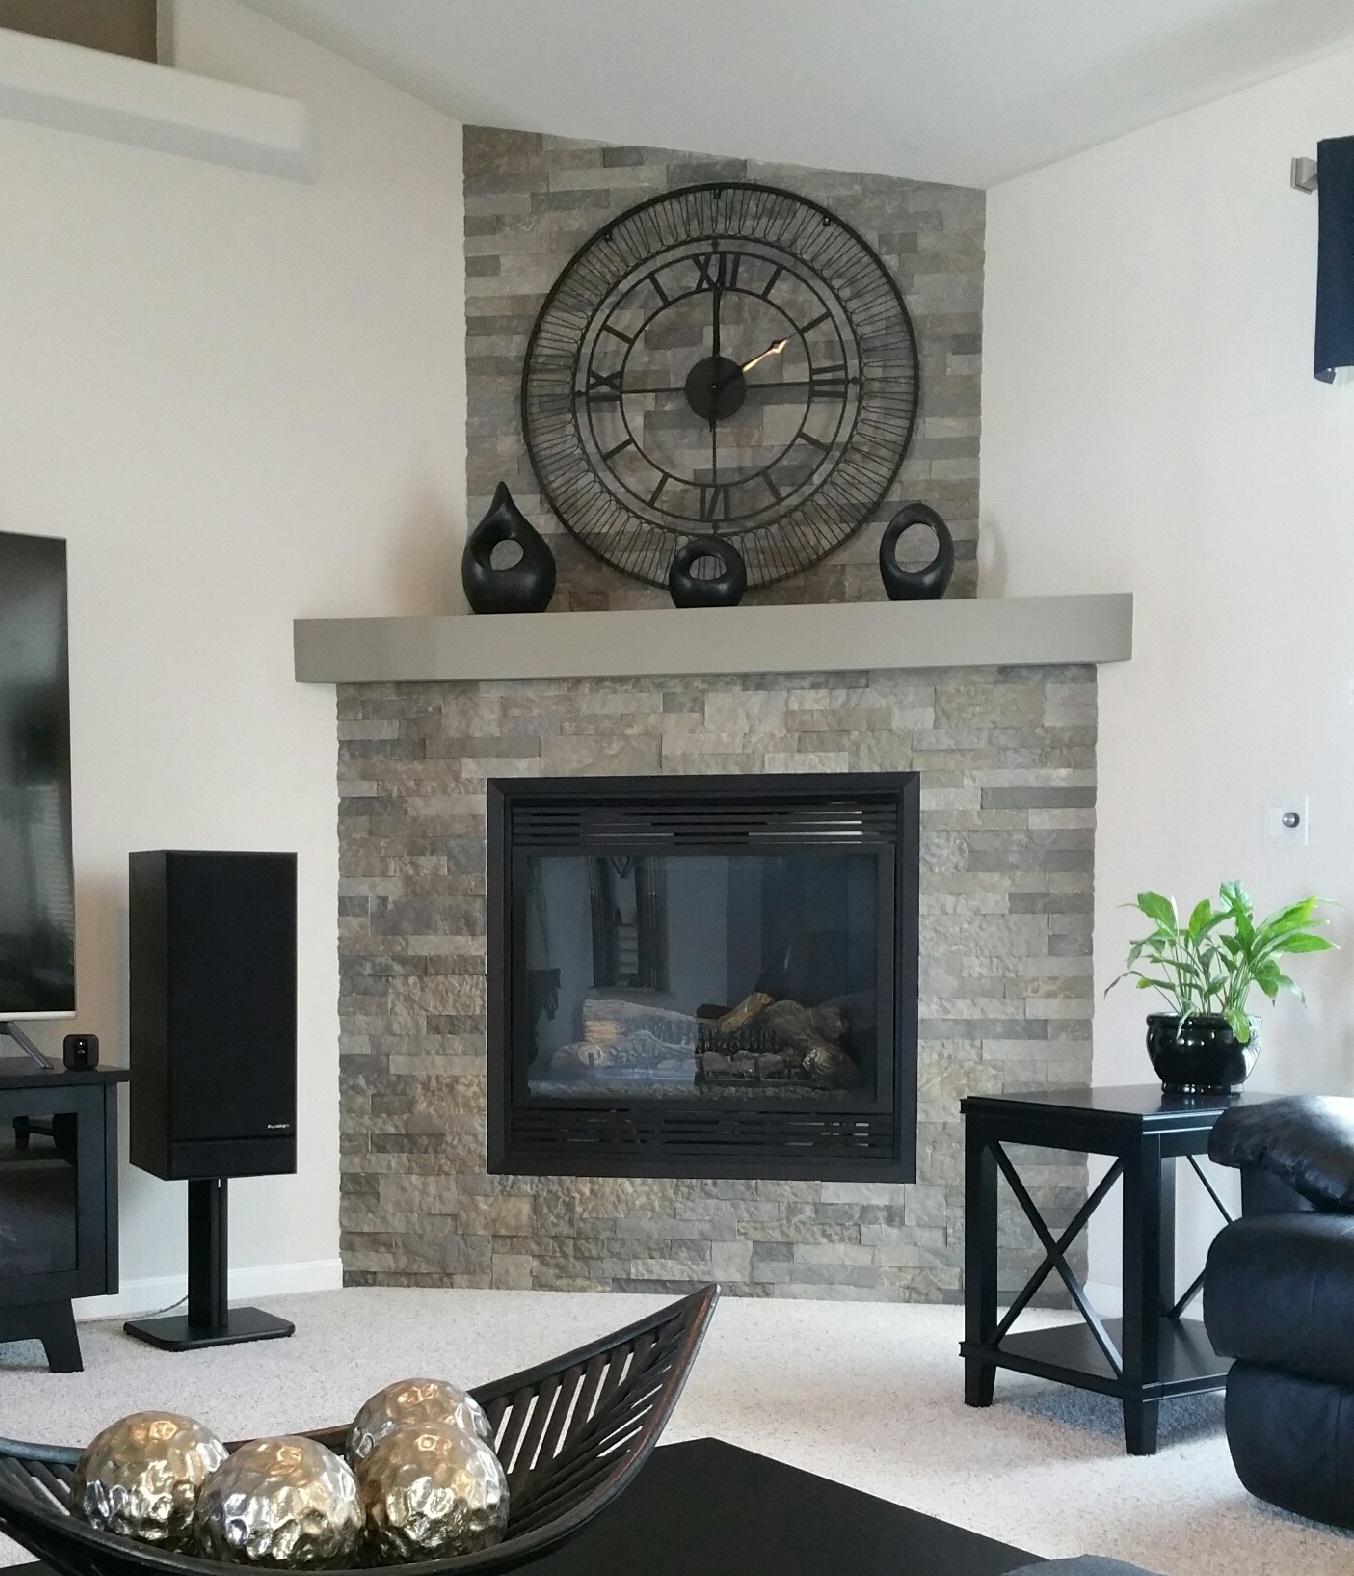 Fireplace living room pic3.jpg